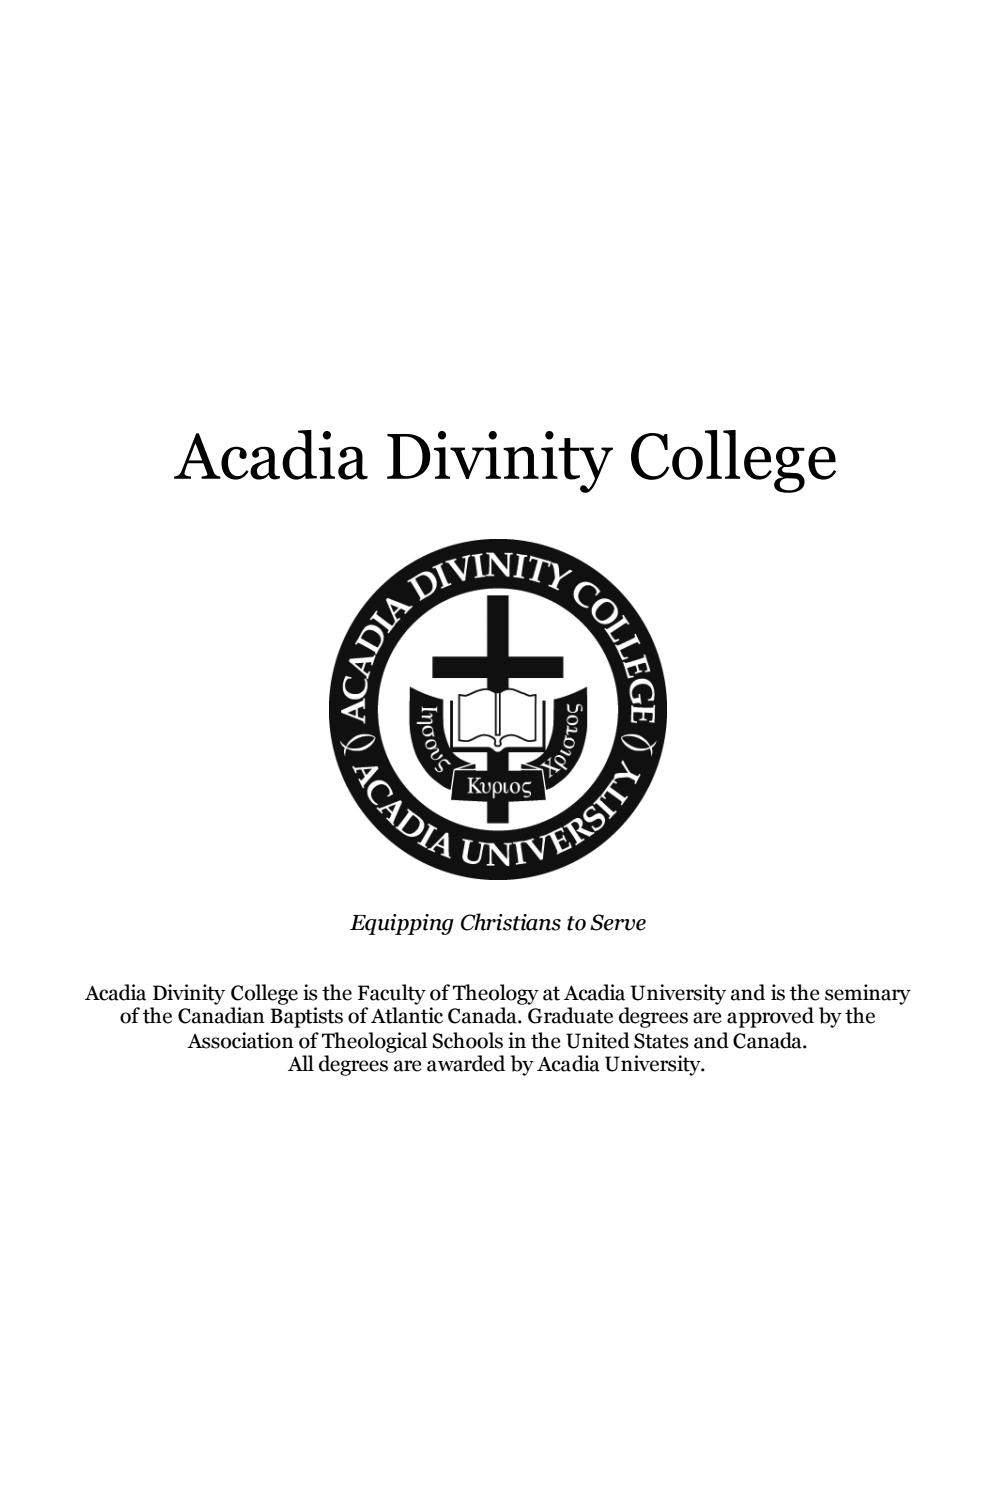 2019 2020 Acadia Divinity College Academic Calendar For Case Western Reserve University Academic Calendar